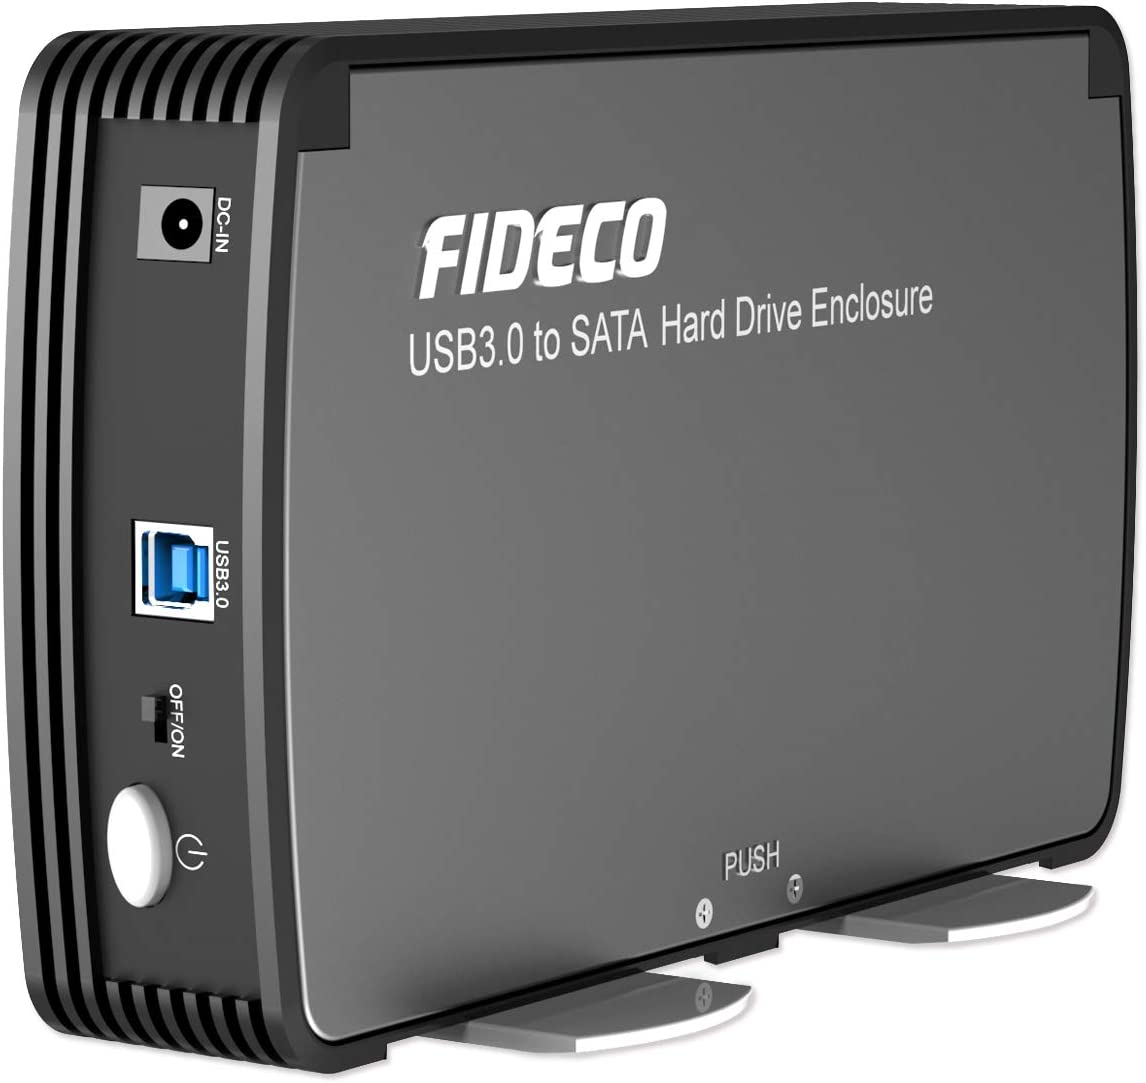 Hard Drive Enclosure 3.5 In SATA III to USB 3.0 Full Aluminum HDD External Case